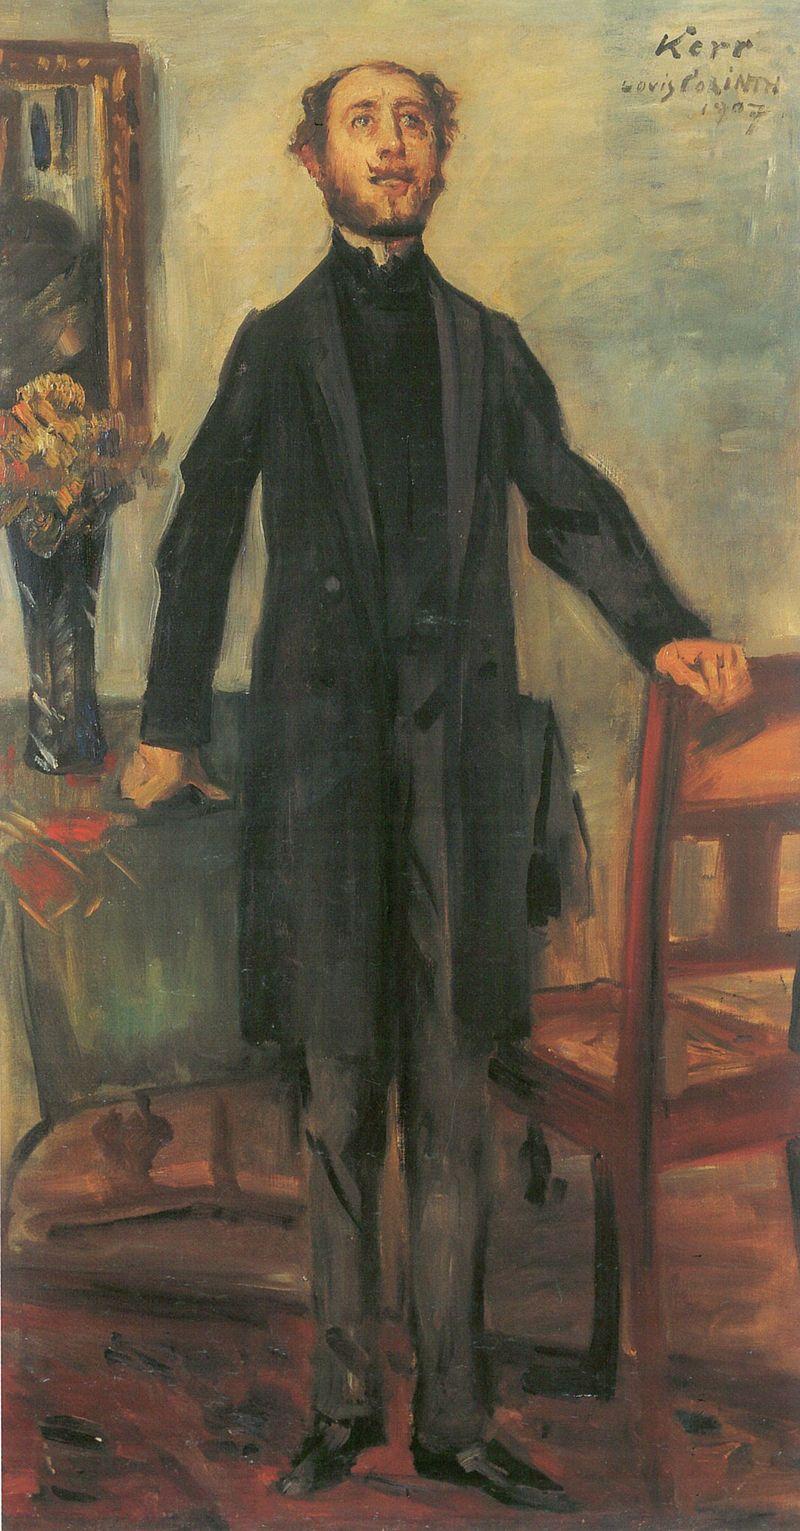 Alfred Kerr, by Lovis Corinth, 1907.jpg